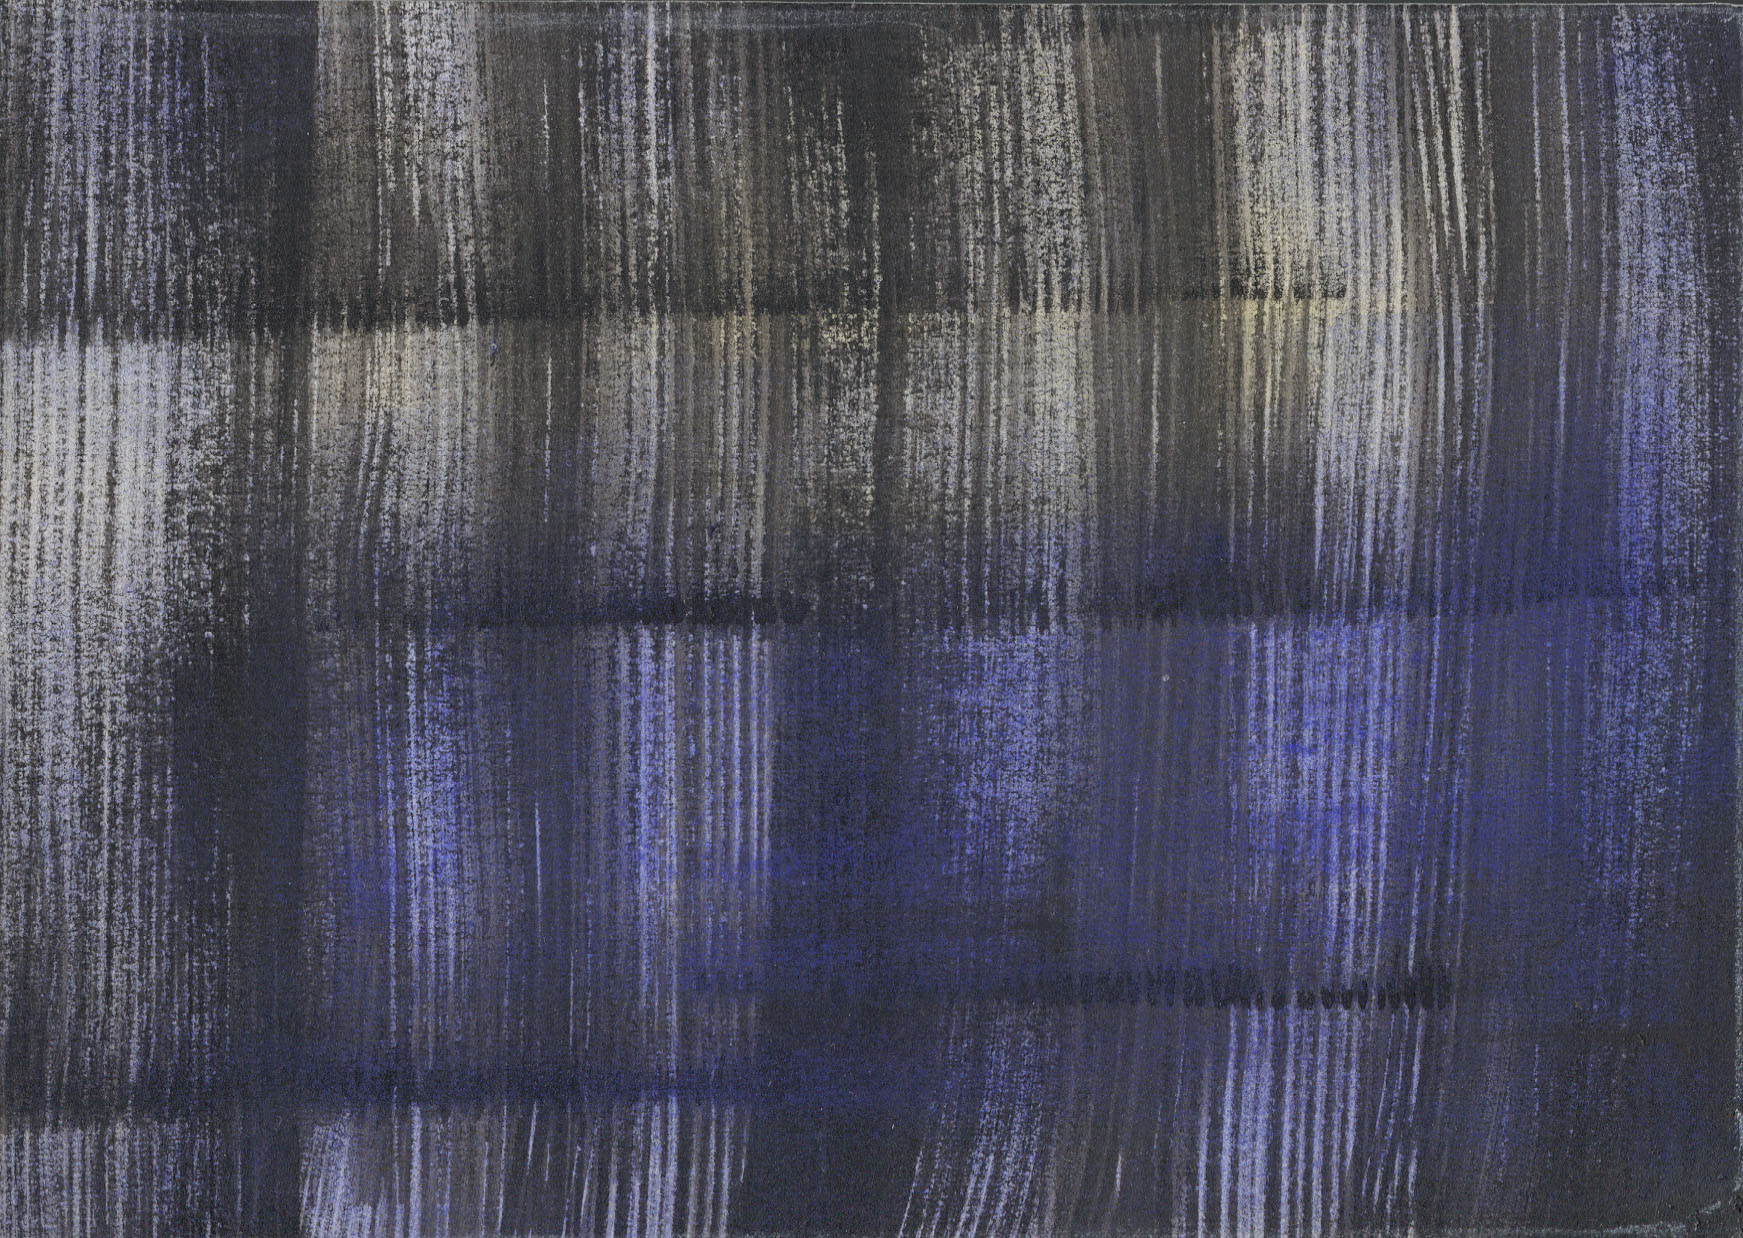 Tooney Philips - Untitled #10.jpg